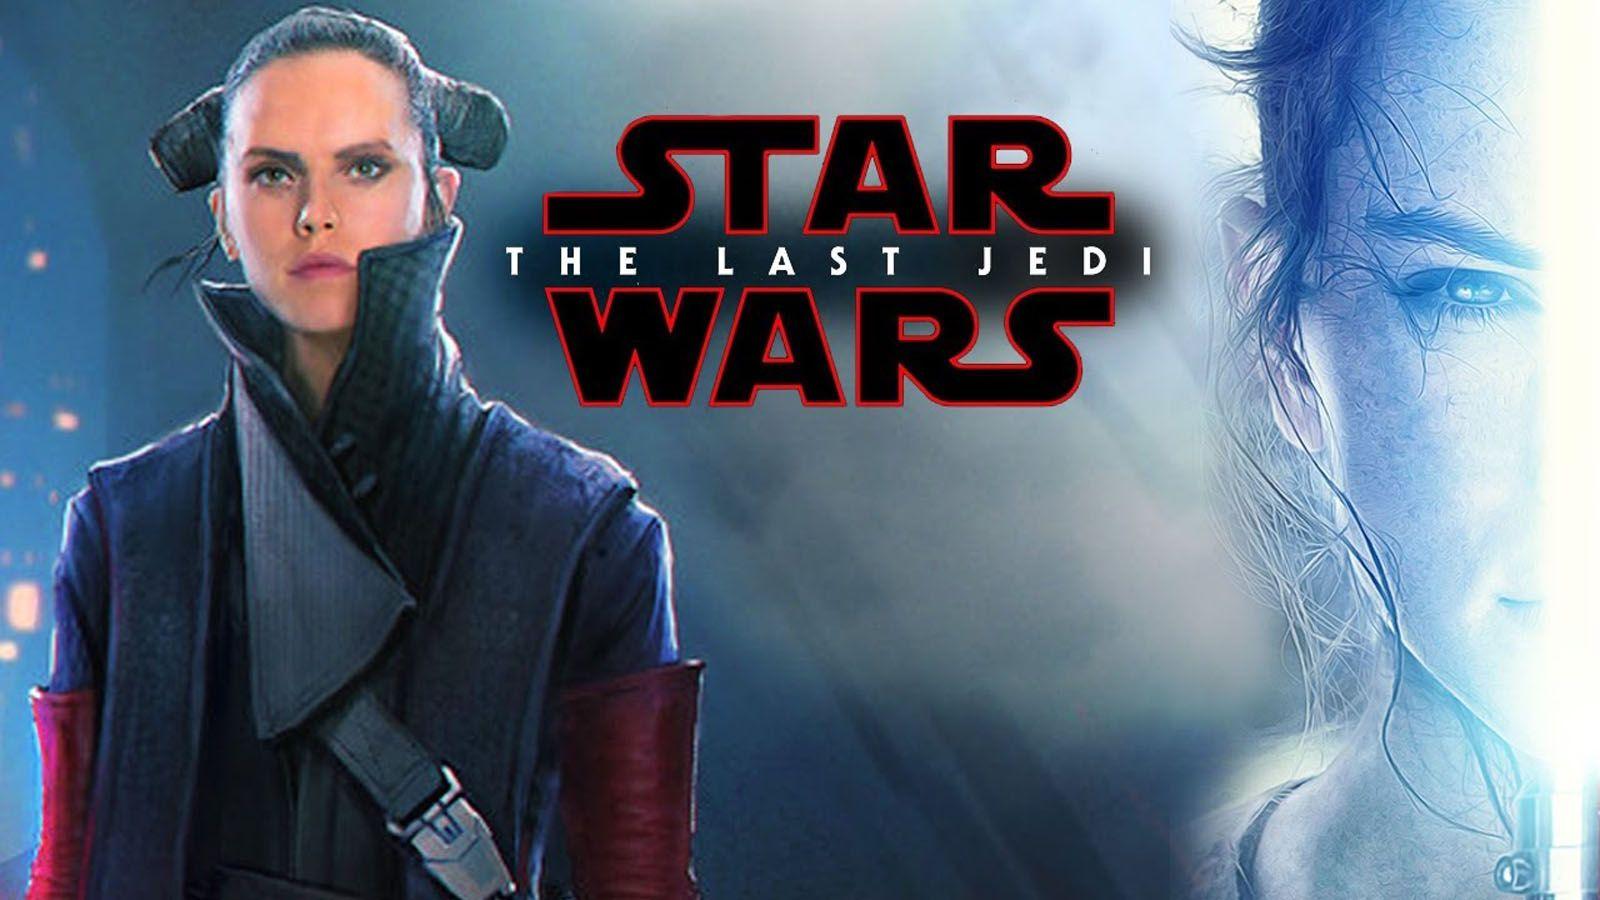 FrEe-onlIne-StrEaMinG-{Star Wars The Last Jedi-FUlL-MoVIe-Movie-2017 ...